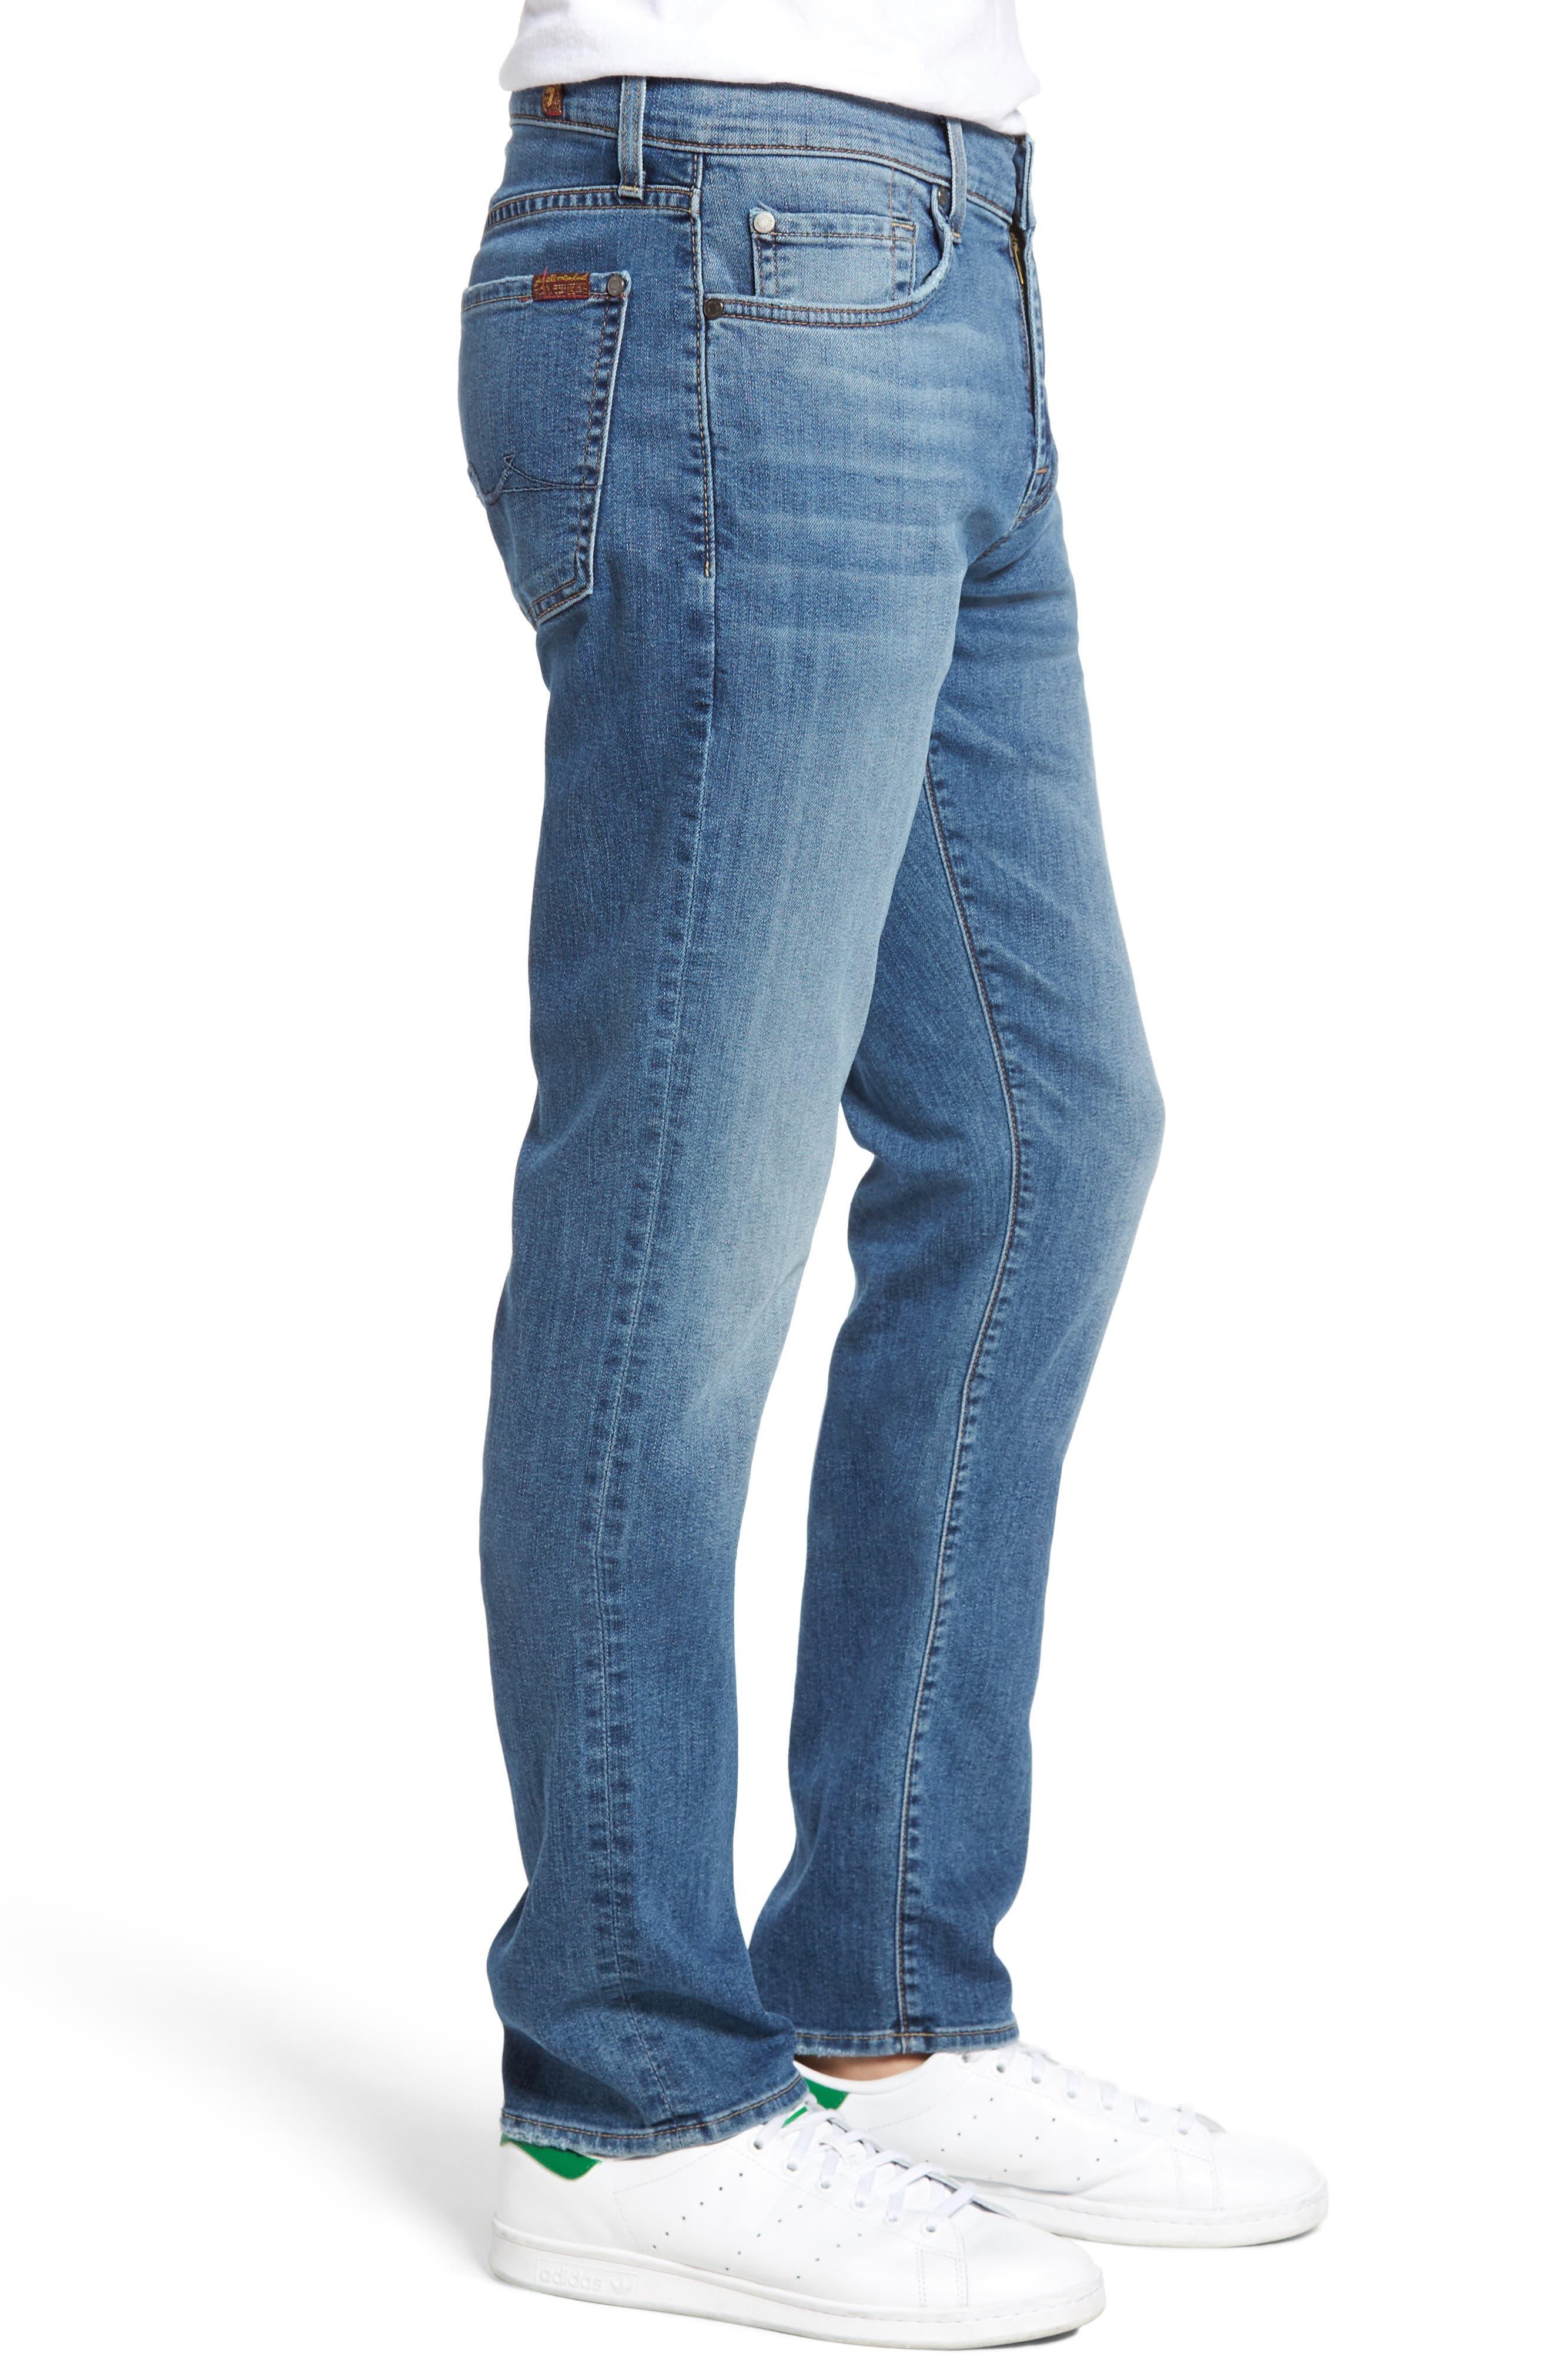 Slimmy Slim Fit Jeans,                             Alternate thumbnail 3, color,                             405